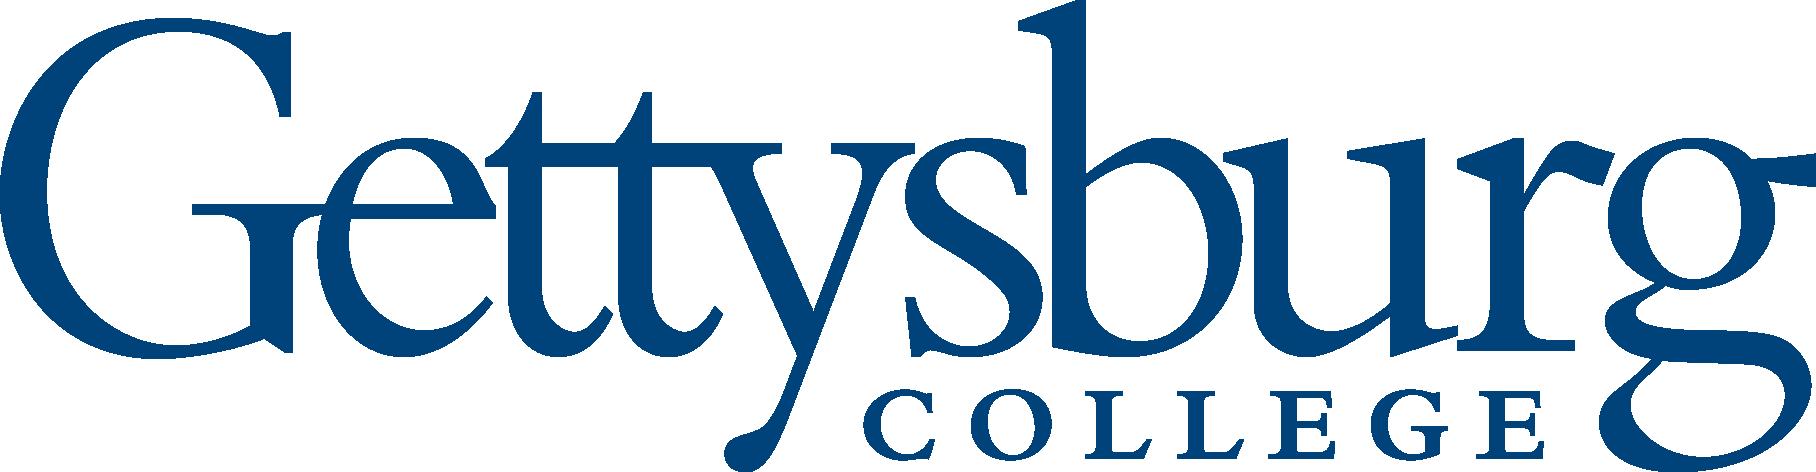 Gettysburg-College-Primary-Logo-(blue294)